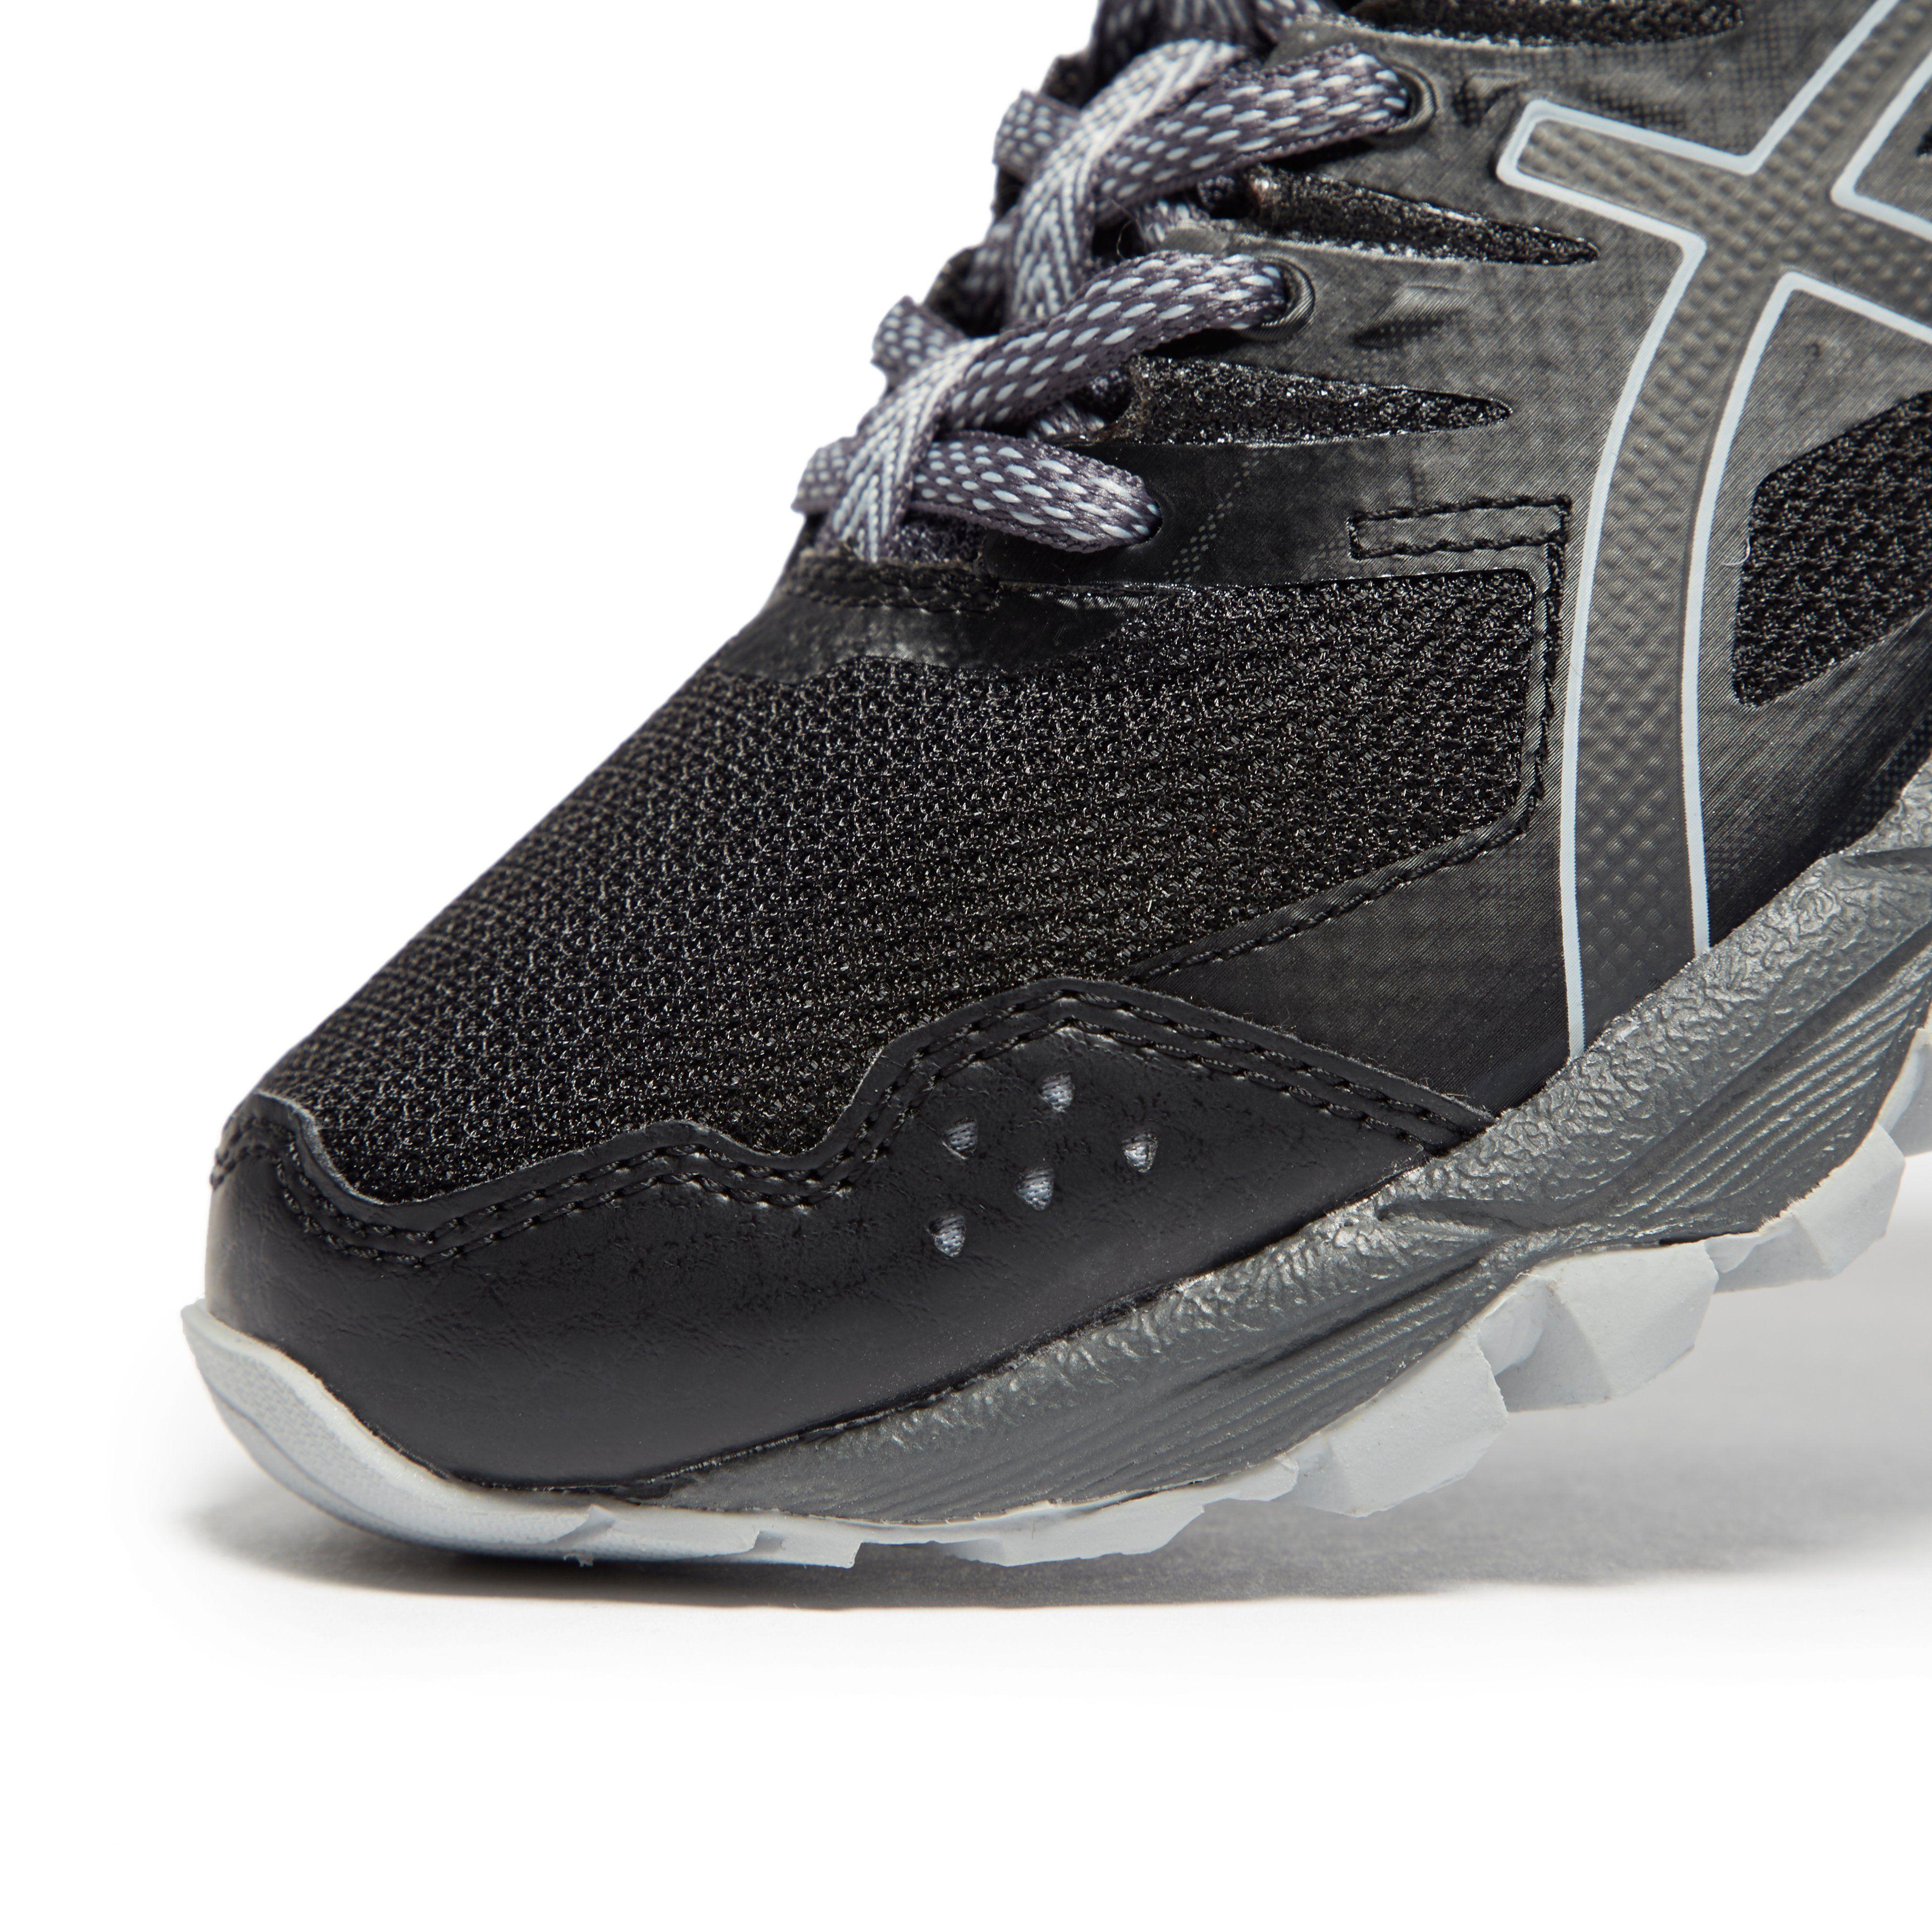 ASICS Gel-Sonoma 3 Women's Trail Running Shoes